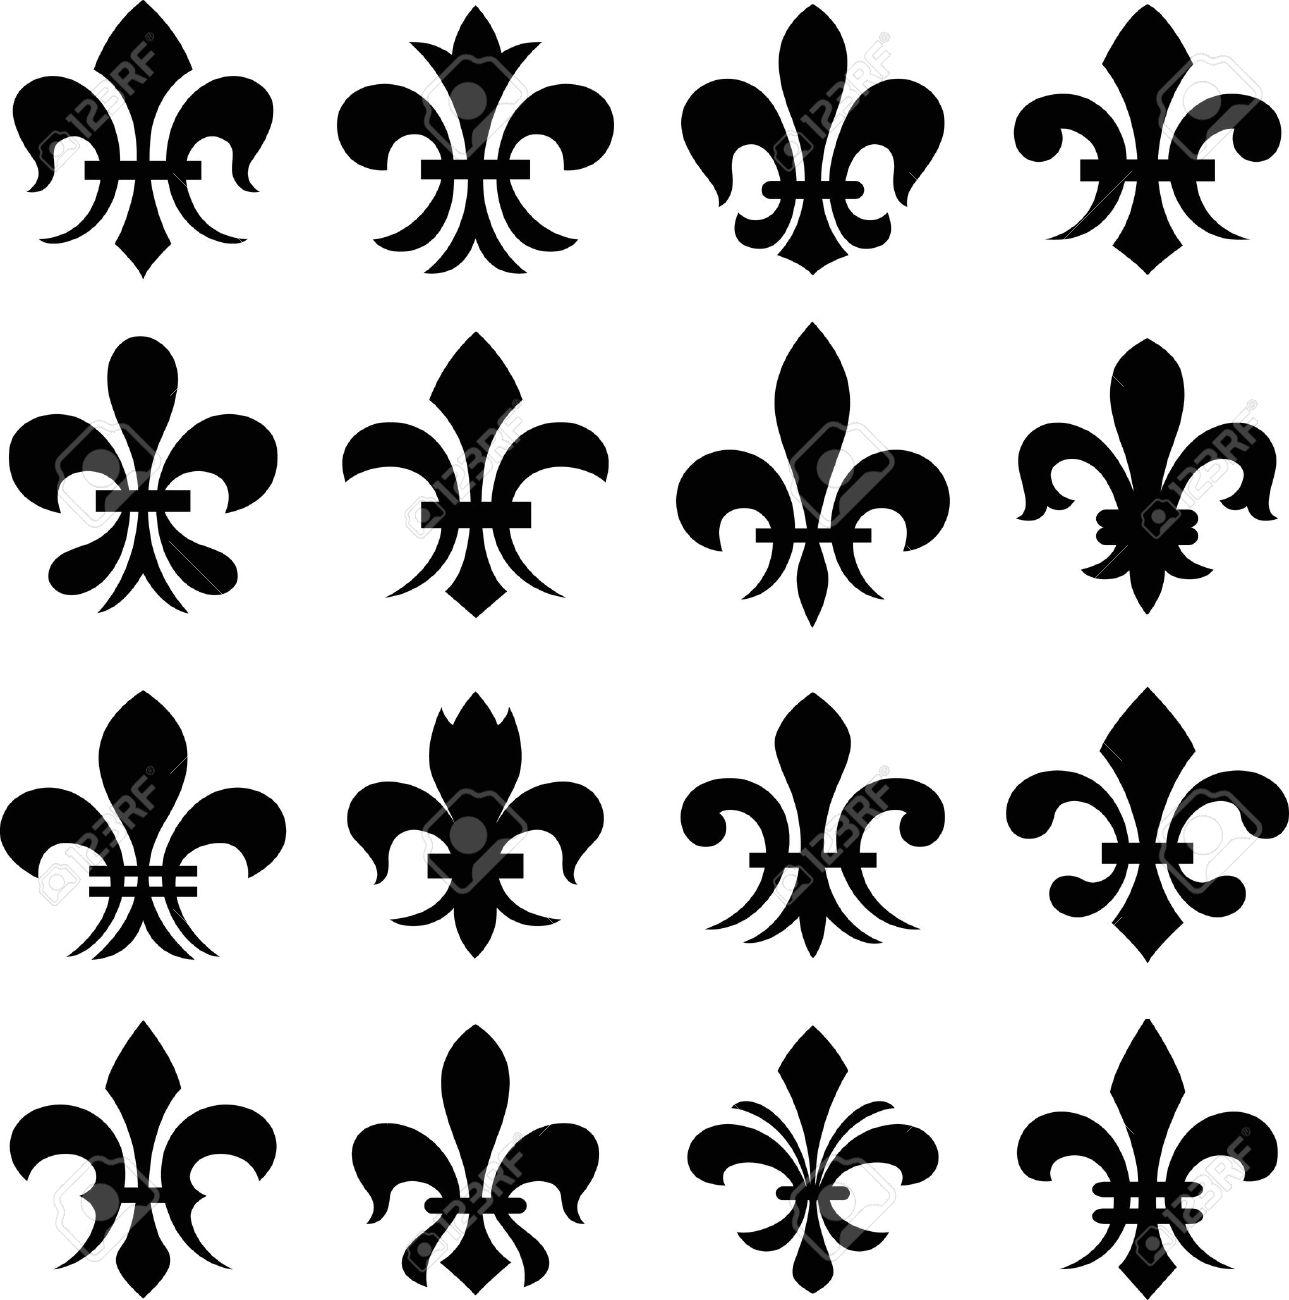 Fleur de lis orleans symbol royalty free cliparts vectors and fleur de lis orleans symbol stock vector 17176496 buycottarizona Images